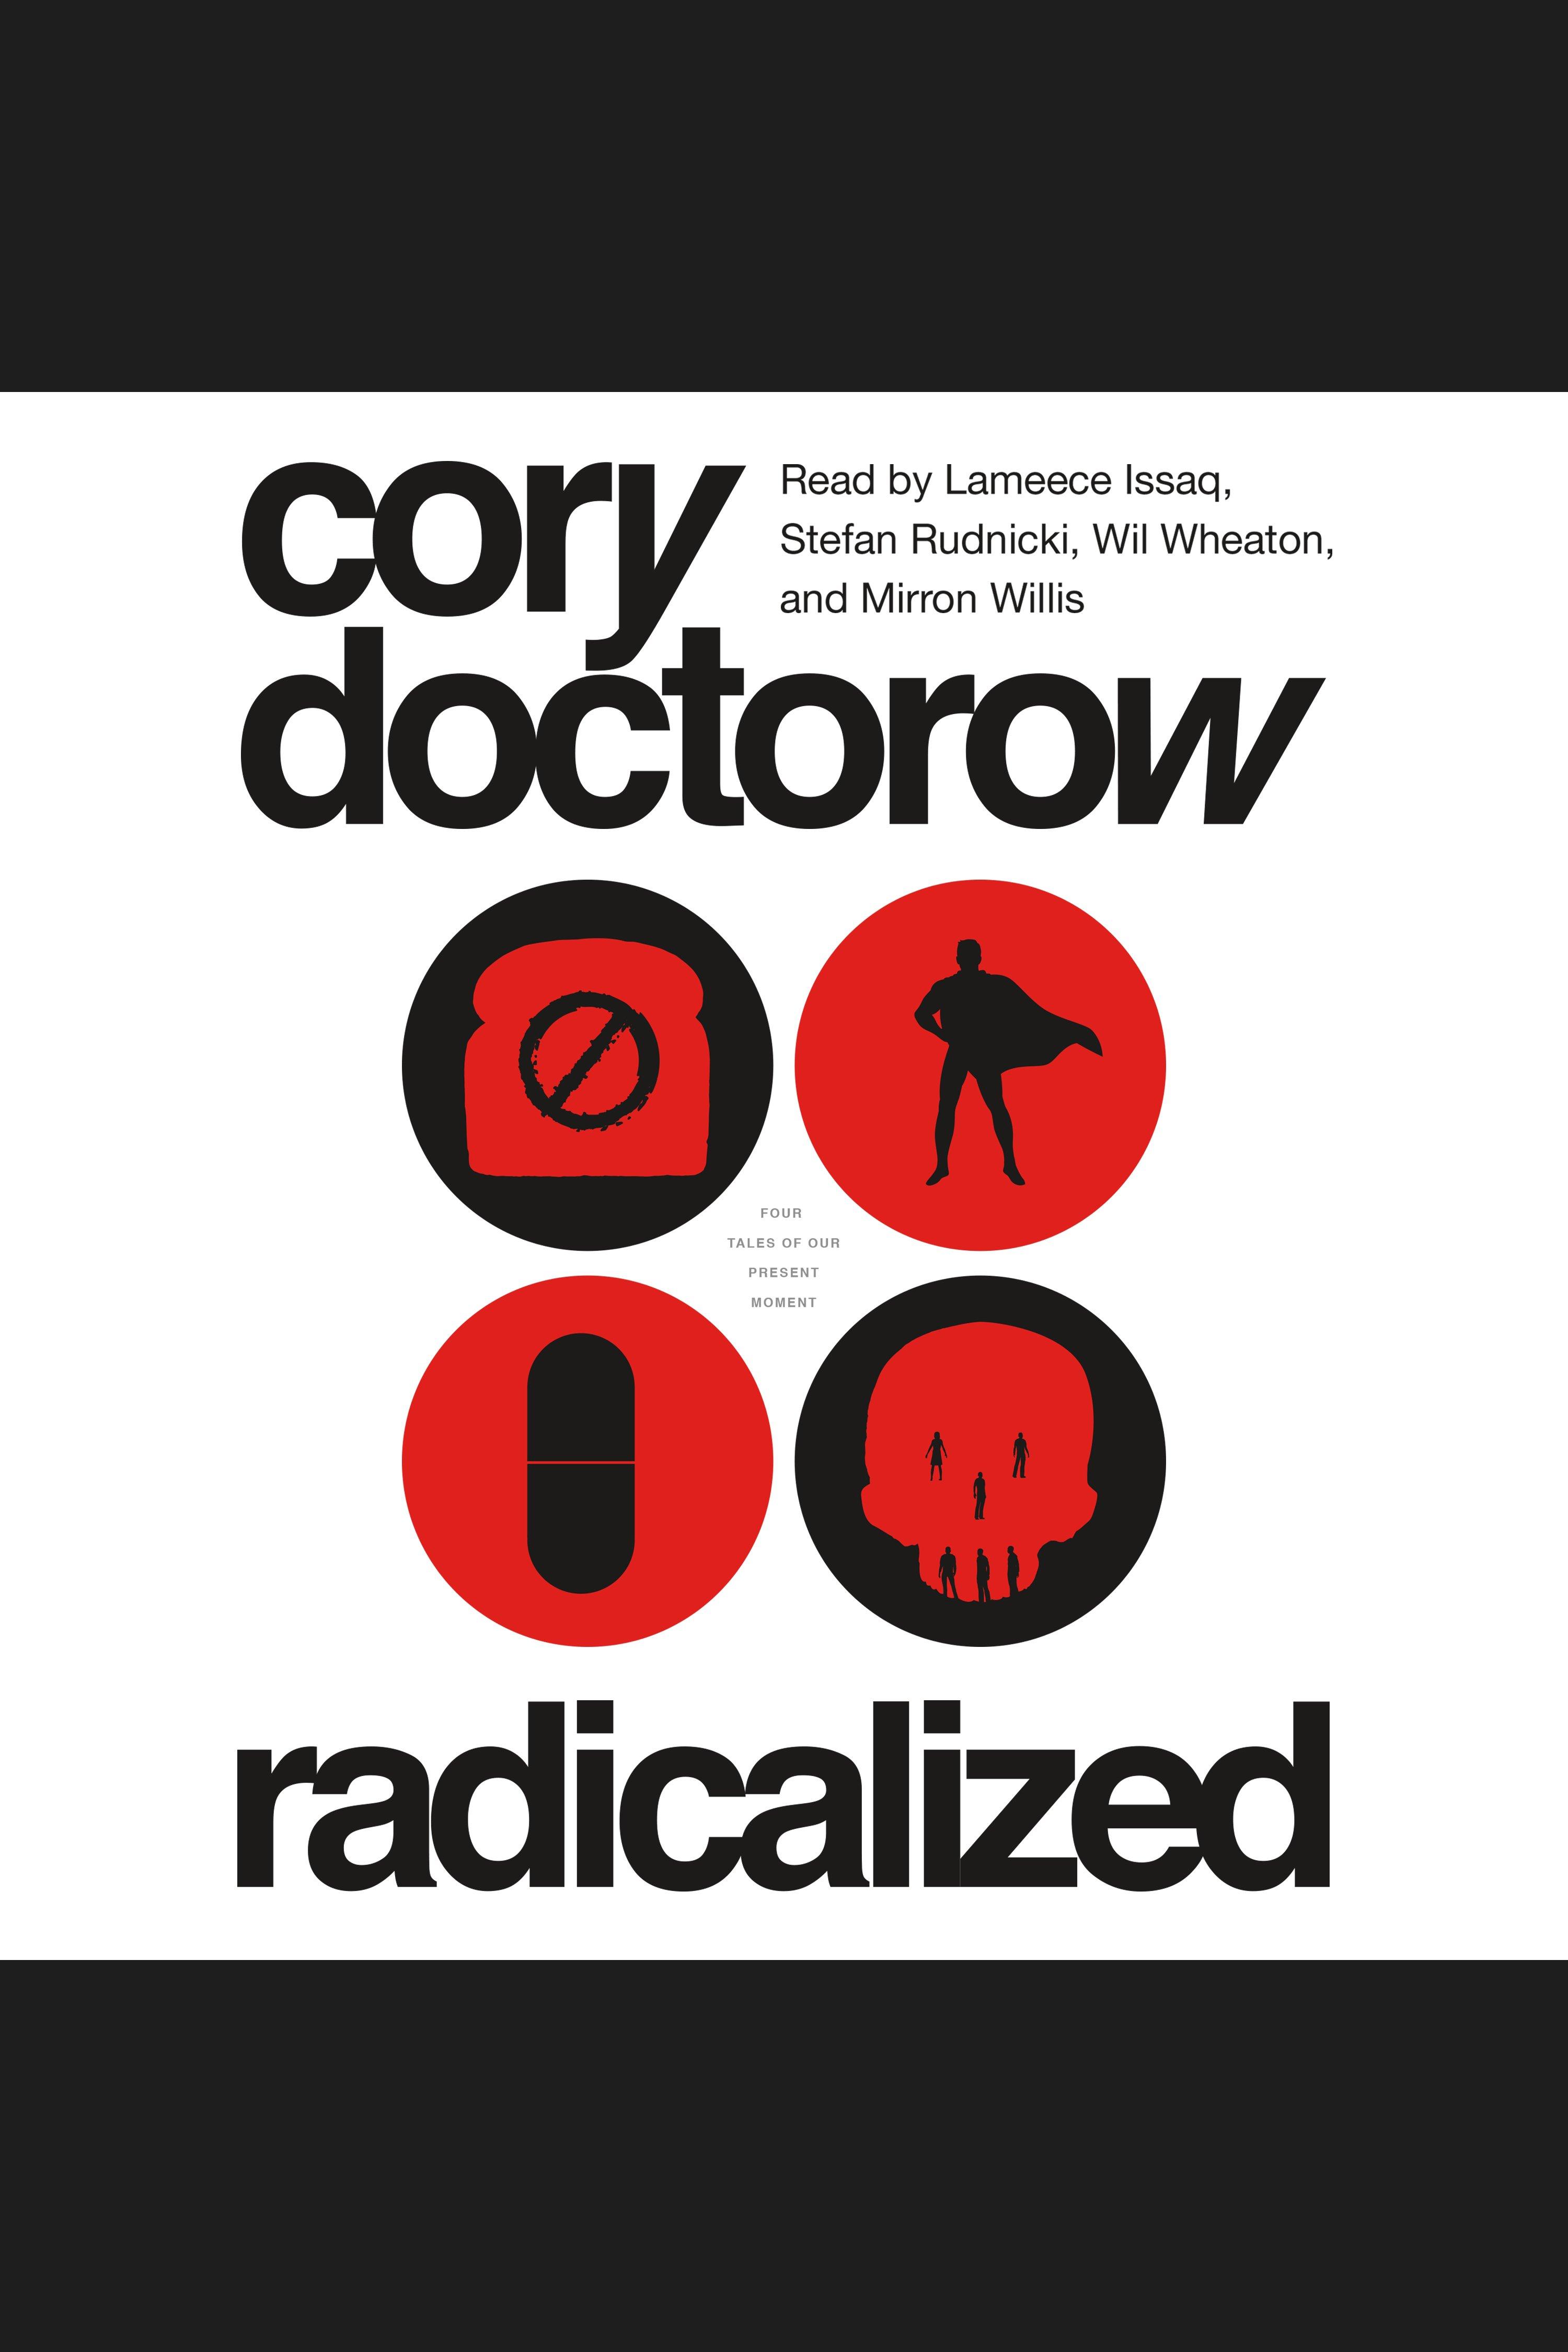 Cover Image of Radicalized